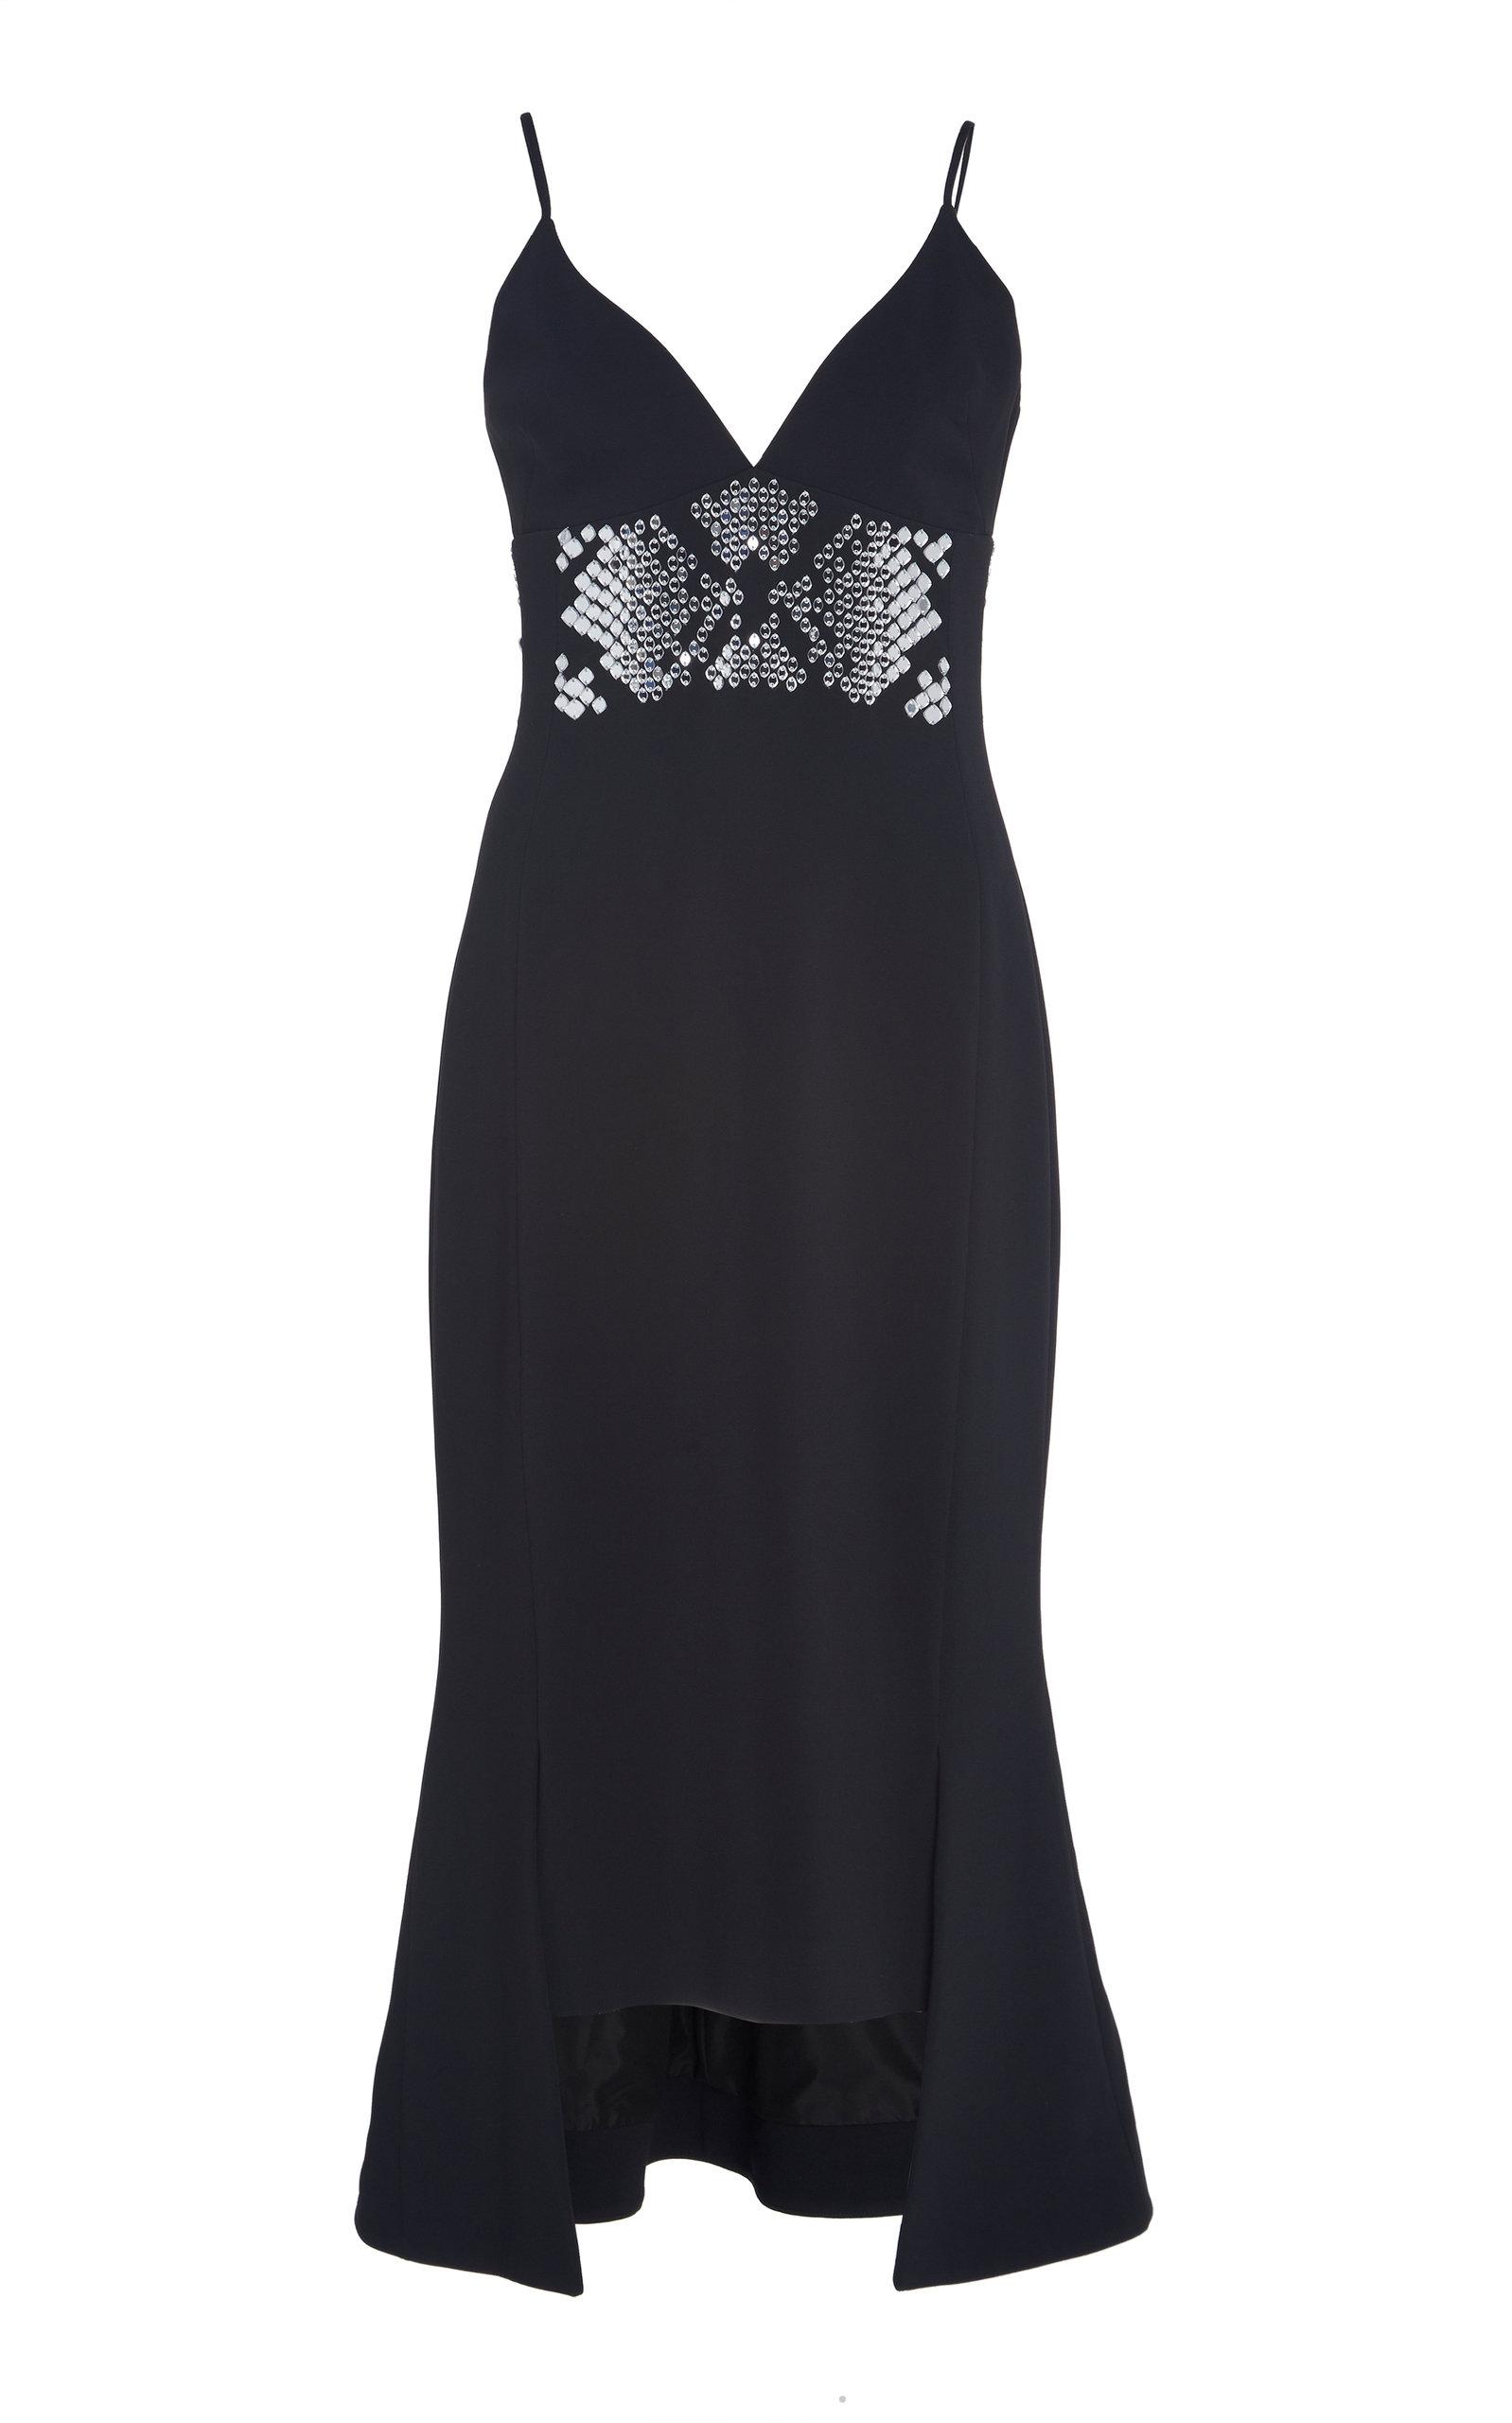 Buy David Koma Plexi Embroidered Asymmetrical Cocktail Dress online, shop David Koma at the best price